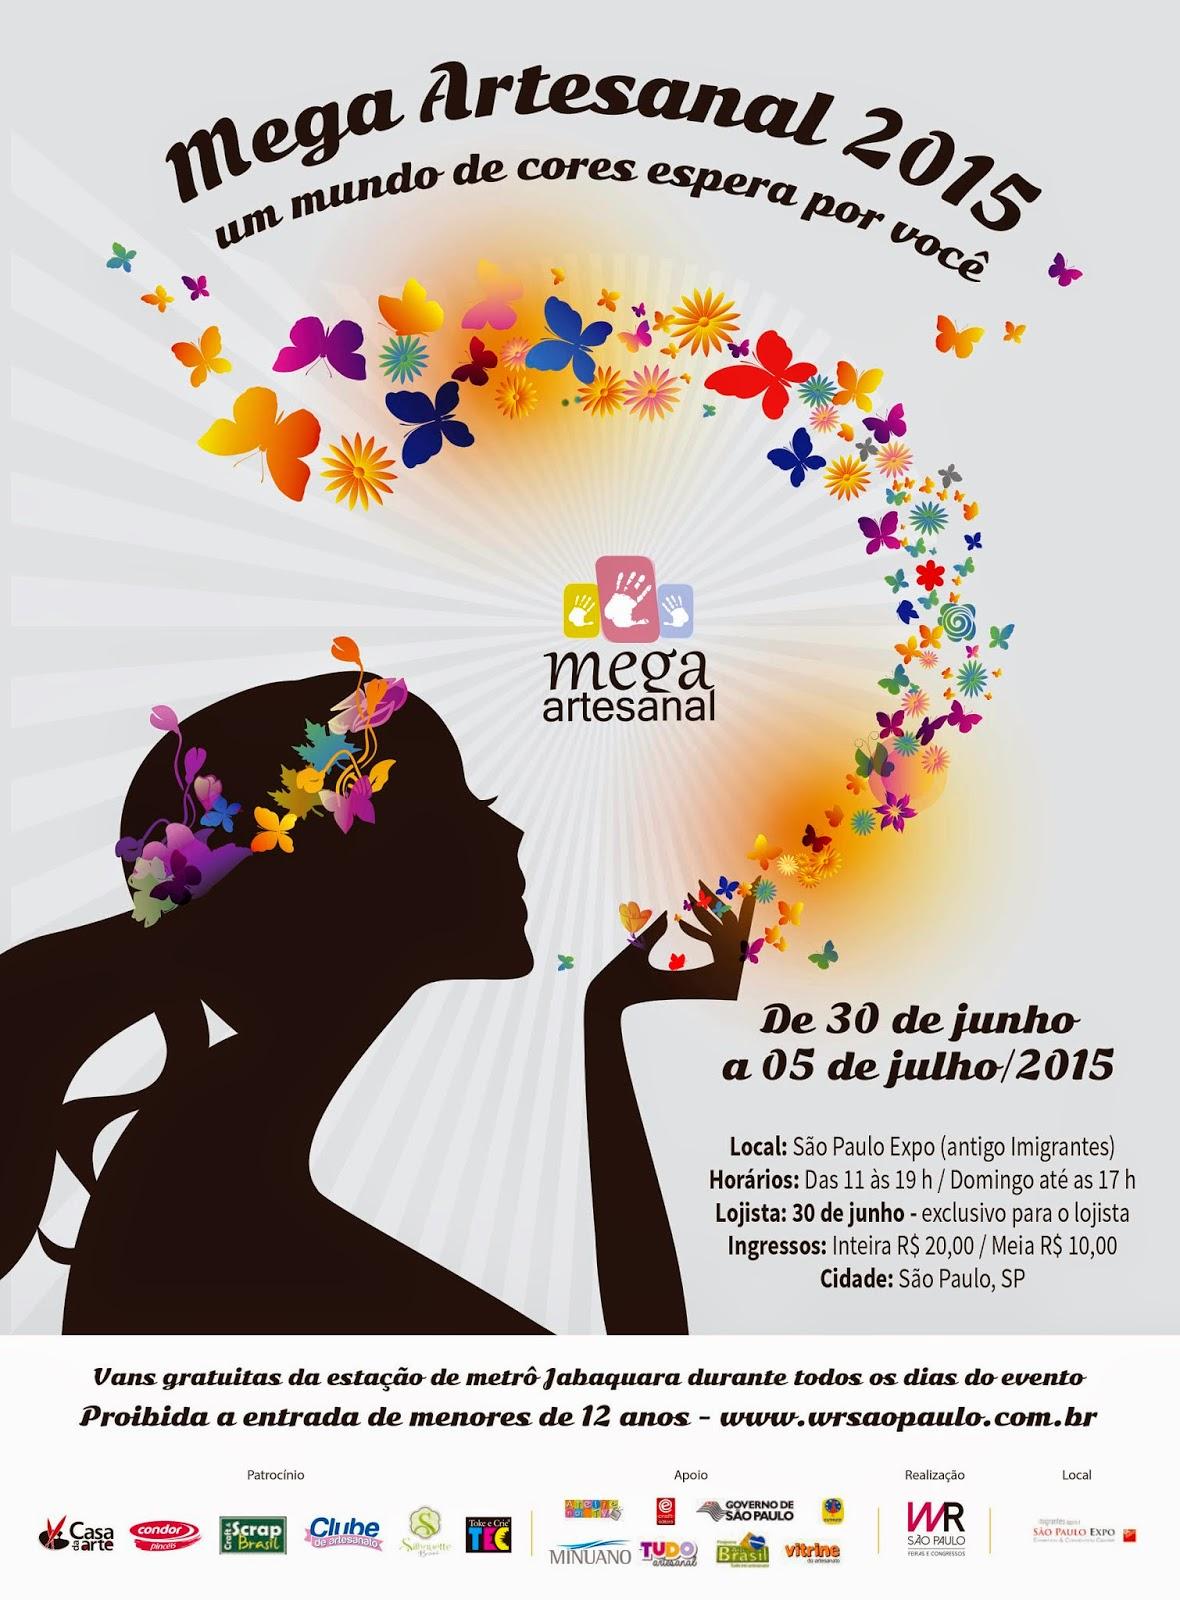 Feira Mega Artesanal 2015